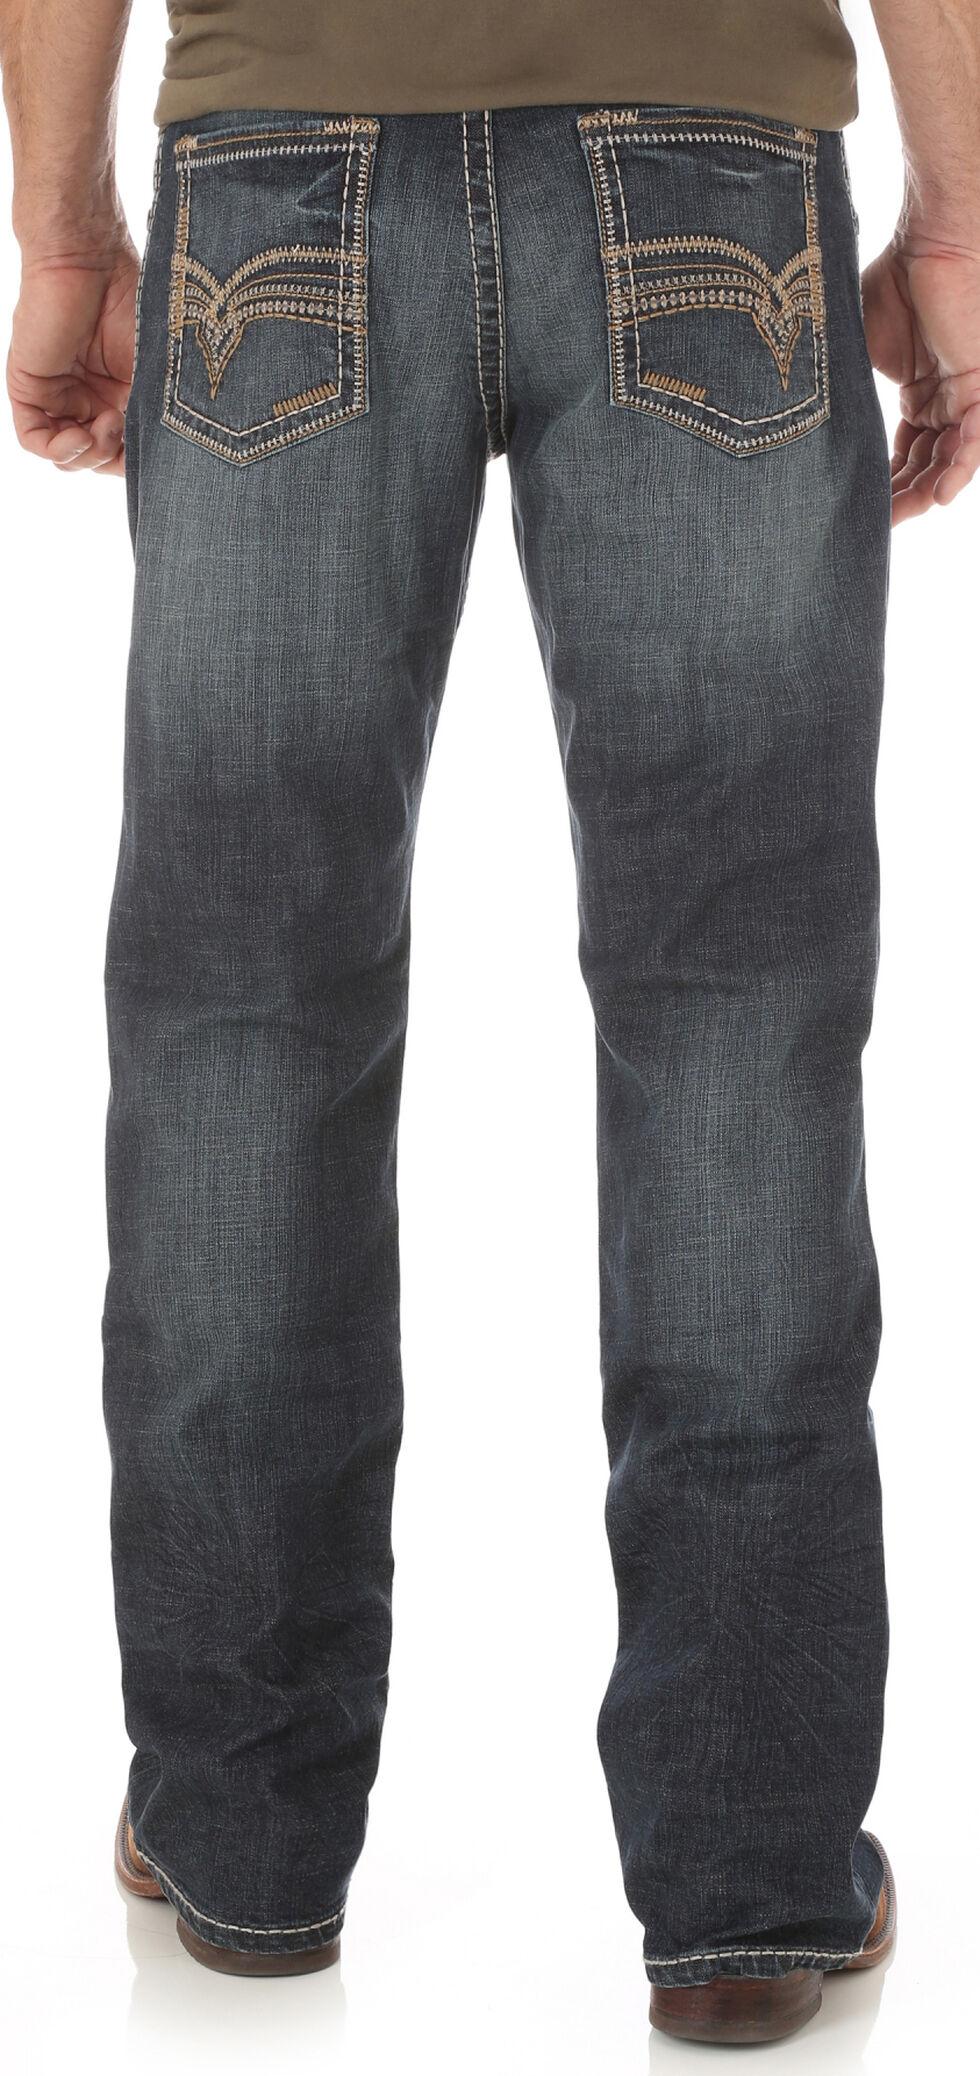 Wrangler Men's Rhythm Slim Boot Jeans - Big & Tall, , hi-res